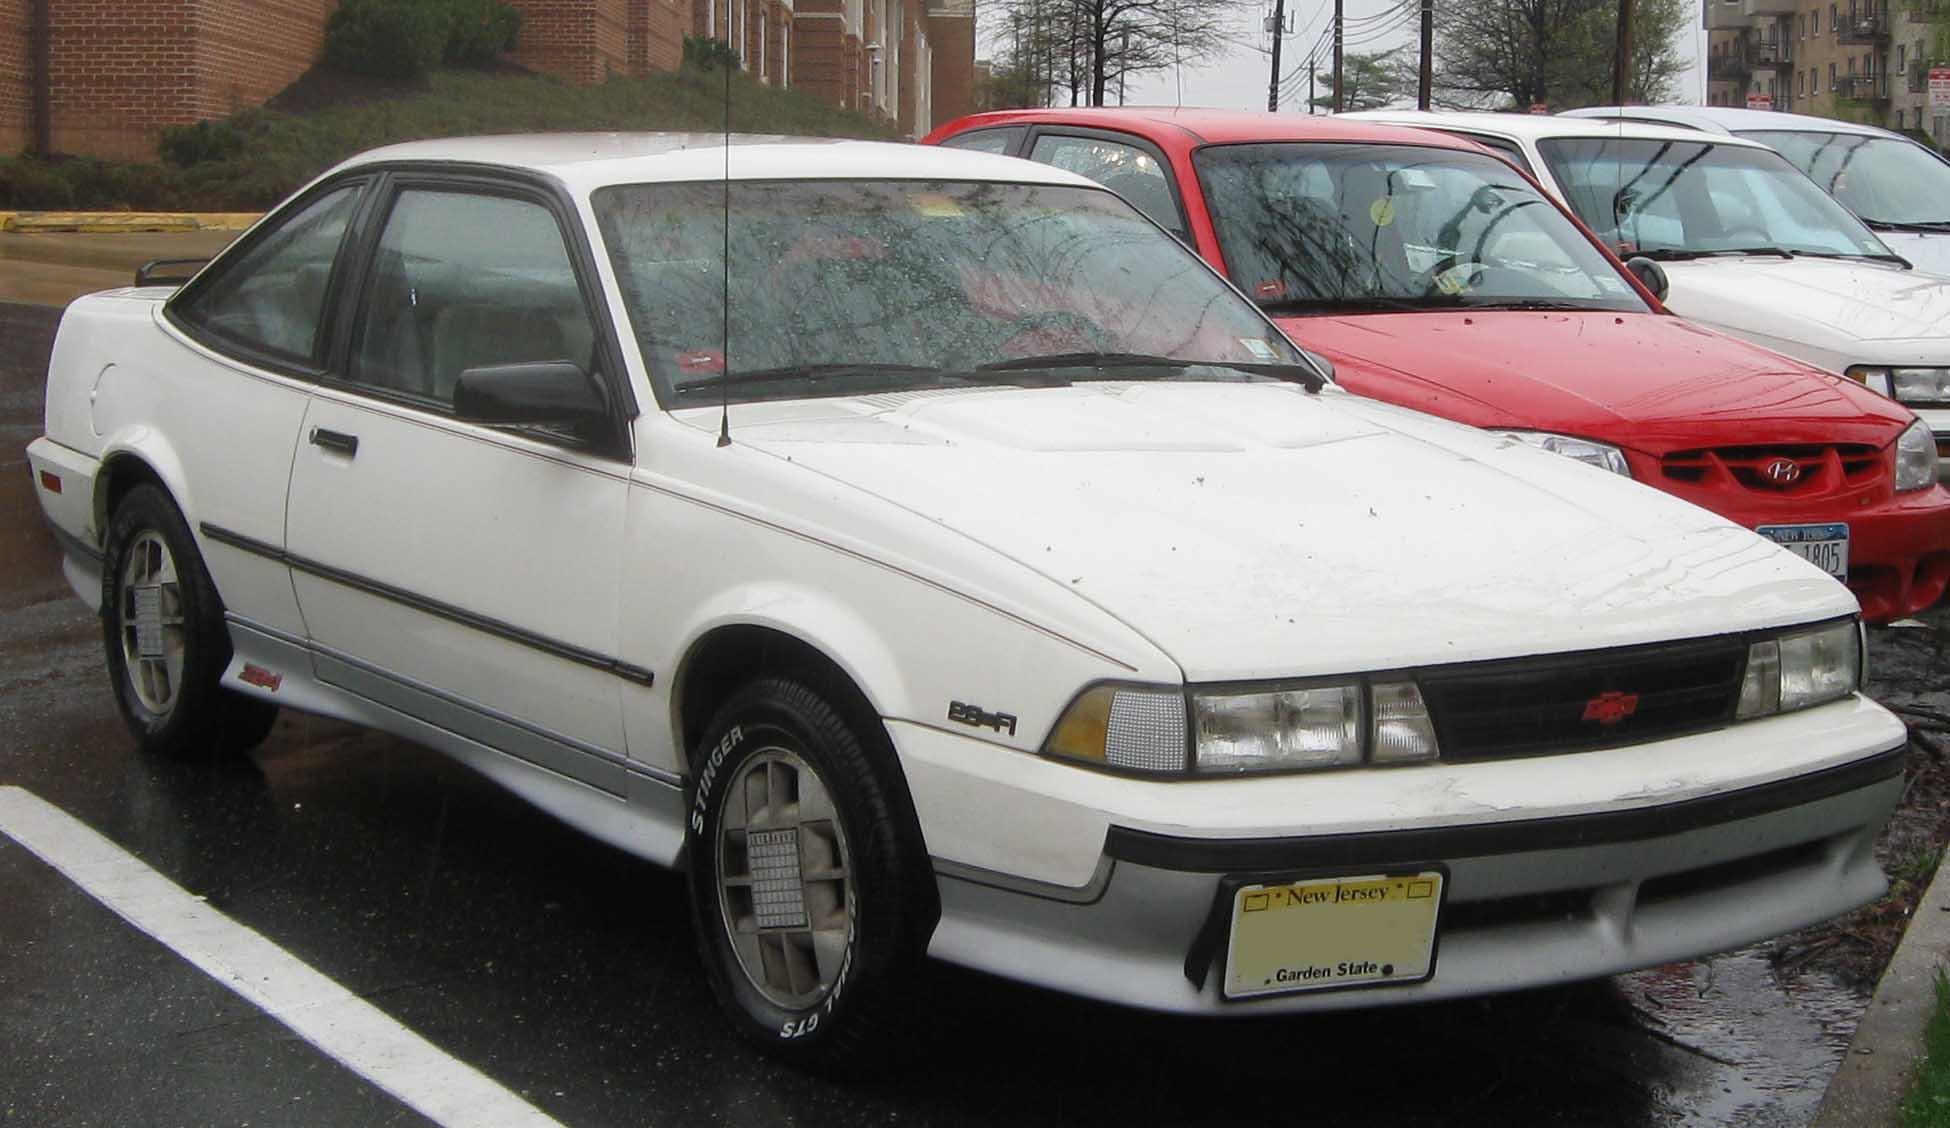 1990 Chevrolet Cavalier Image 4